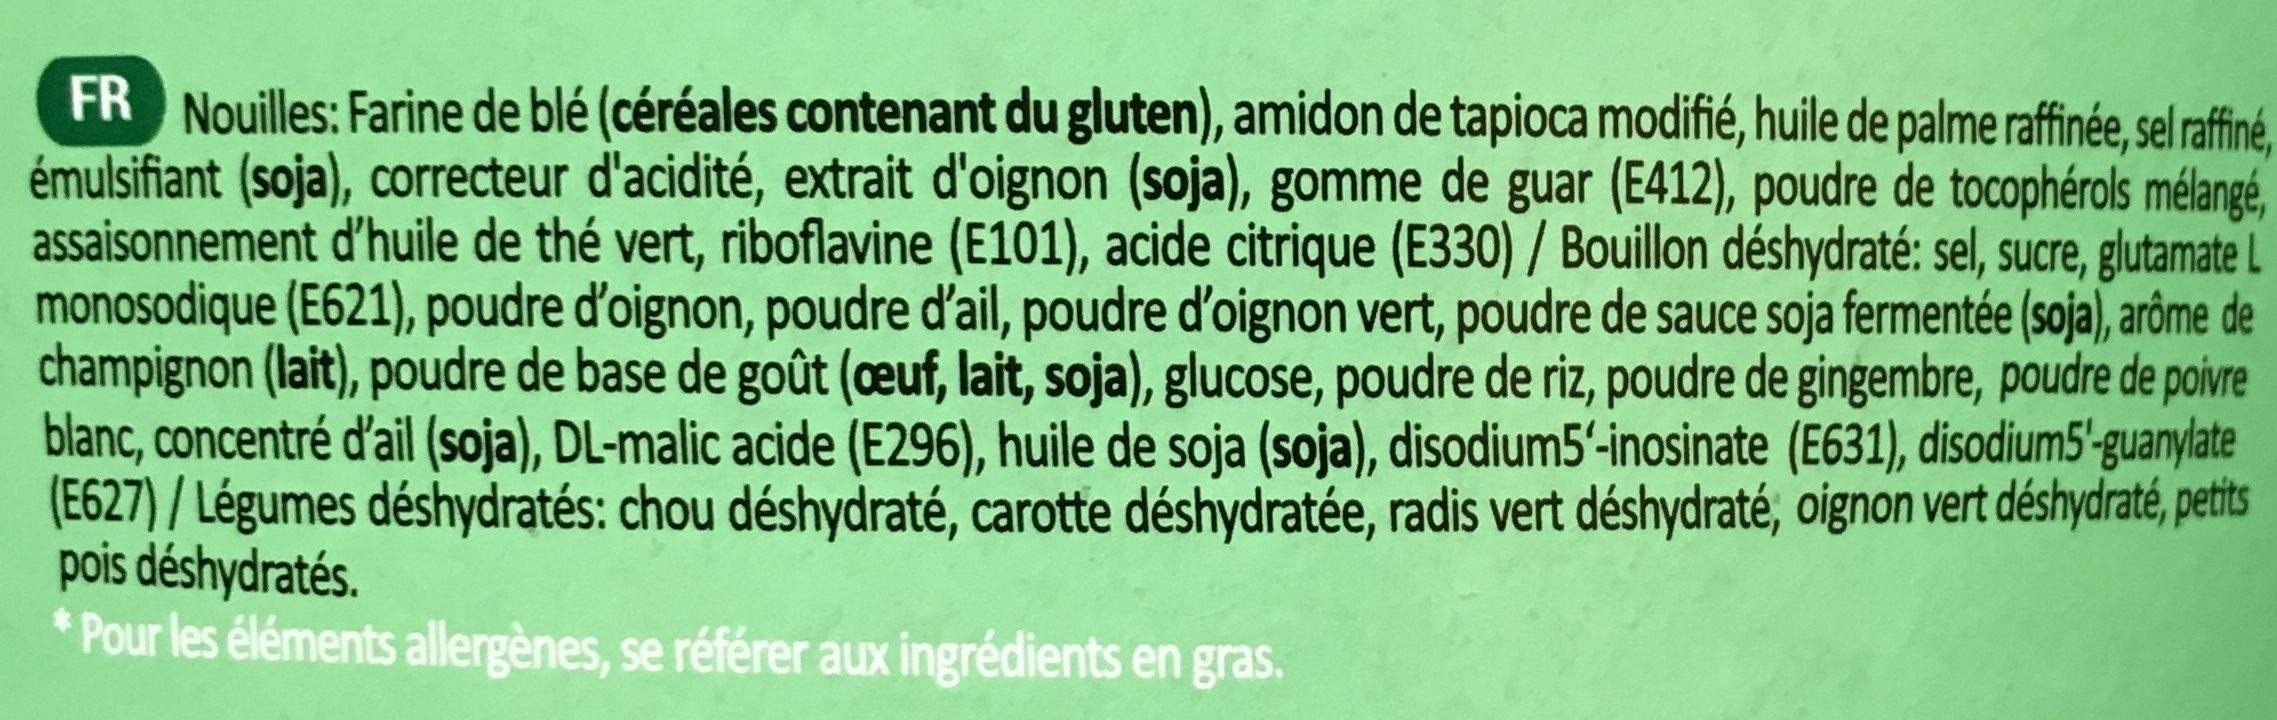 Nouilles légumes - Ingredienti - fr